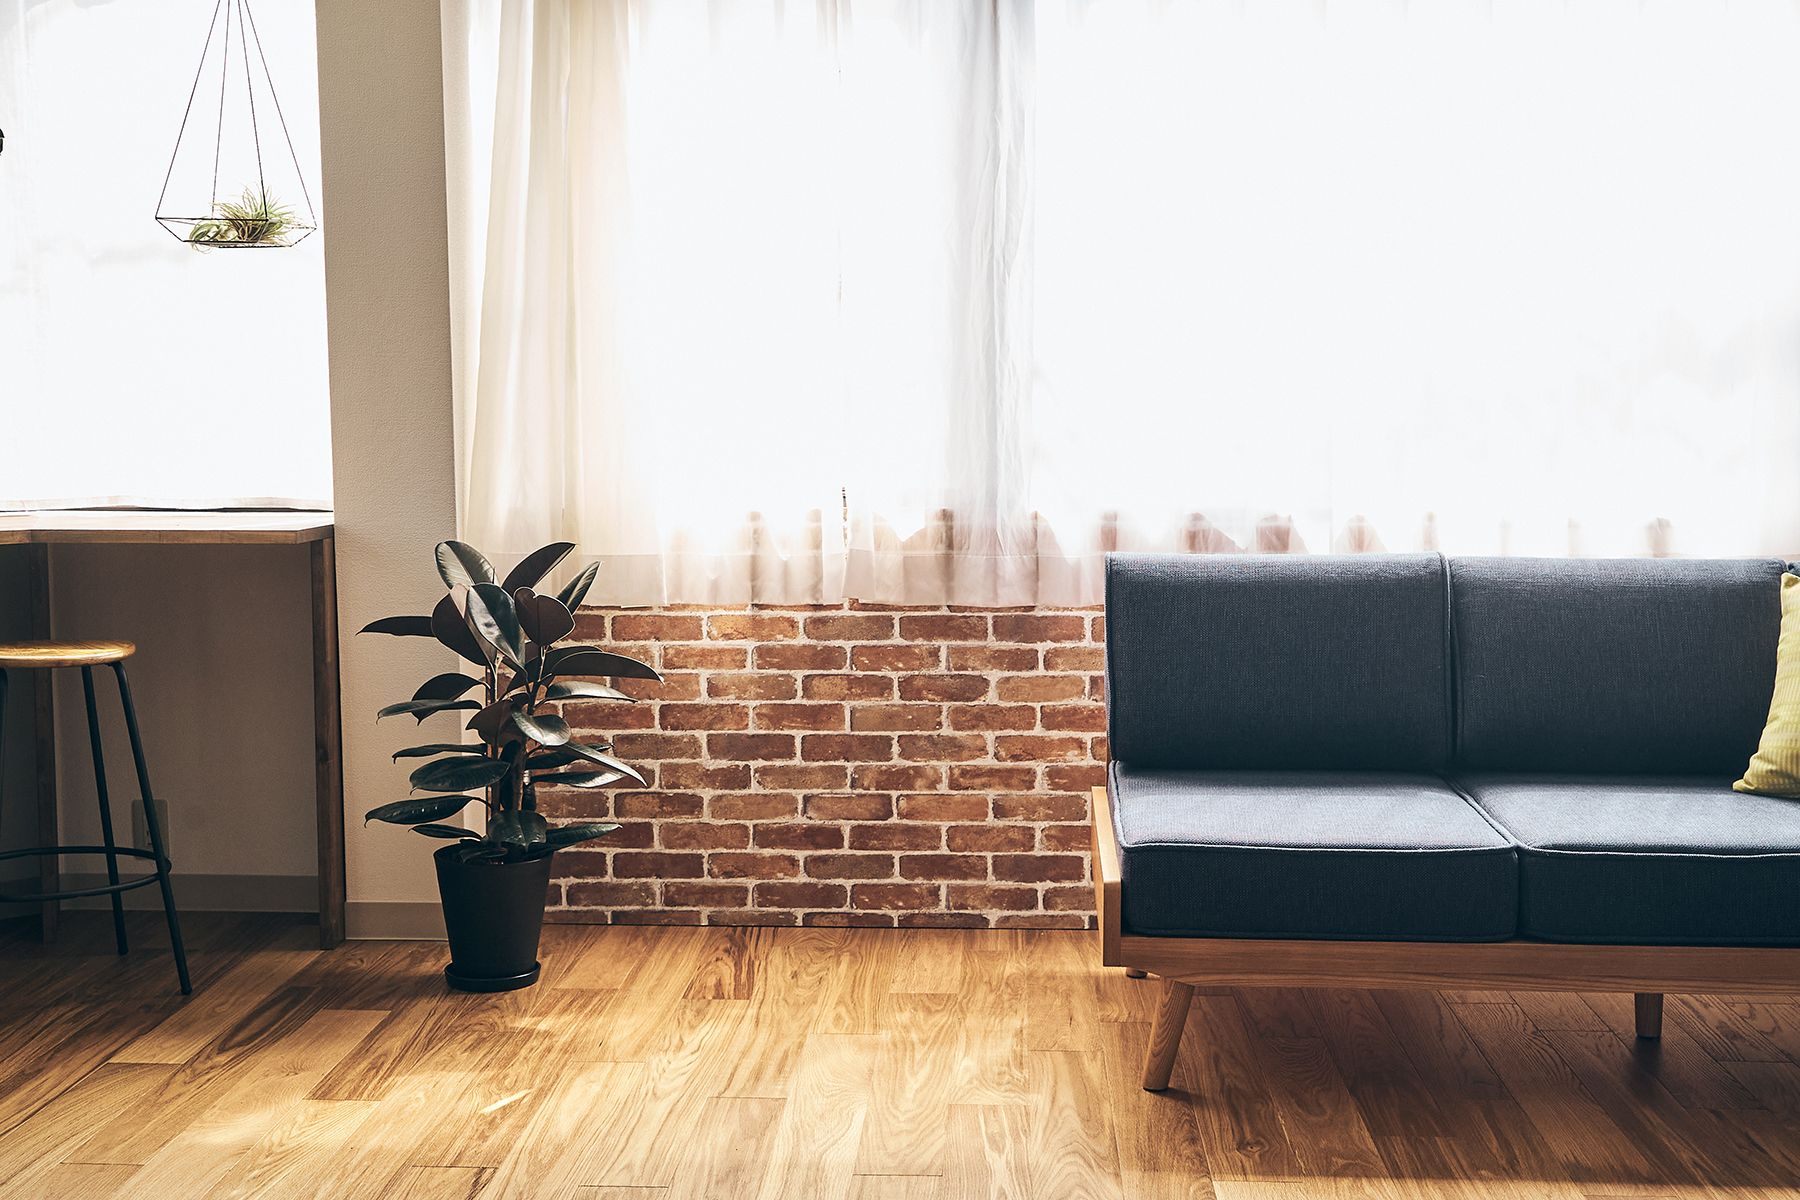 studio B (スタジオ ビー)2F 壁はパネルでアレンジ可能(煉瓦)